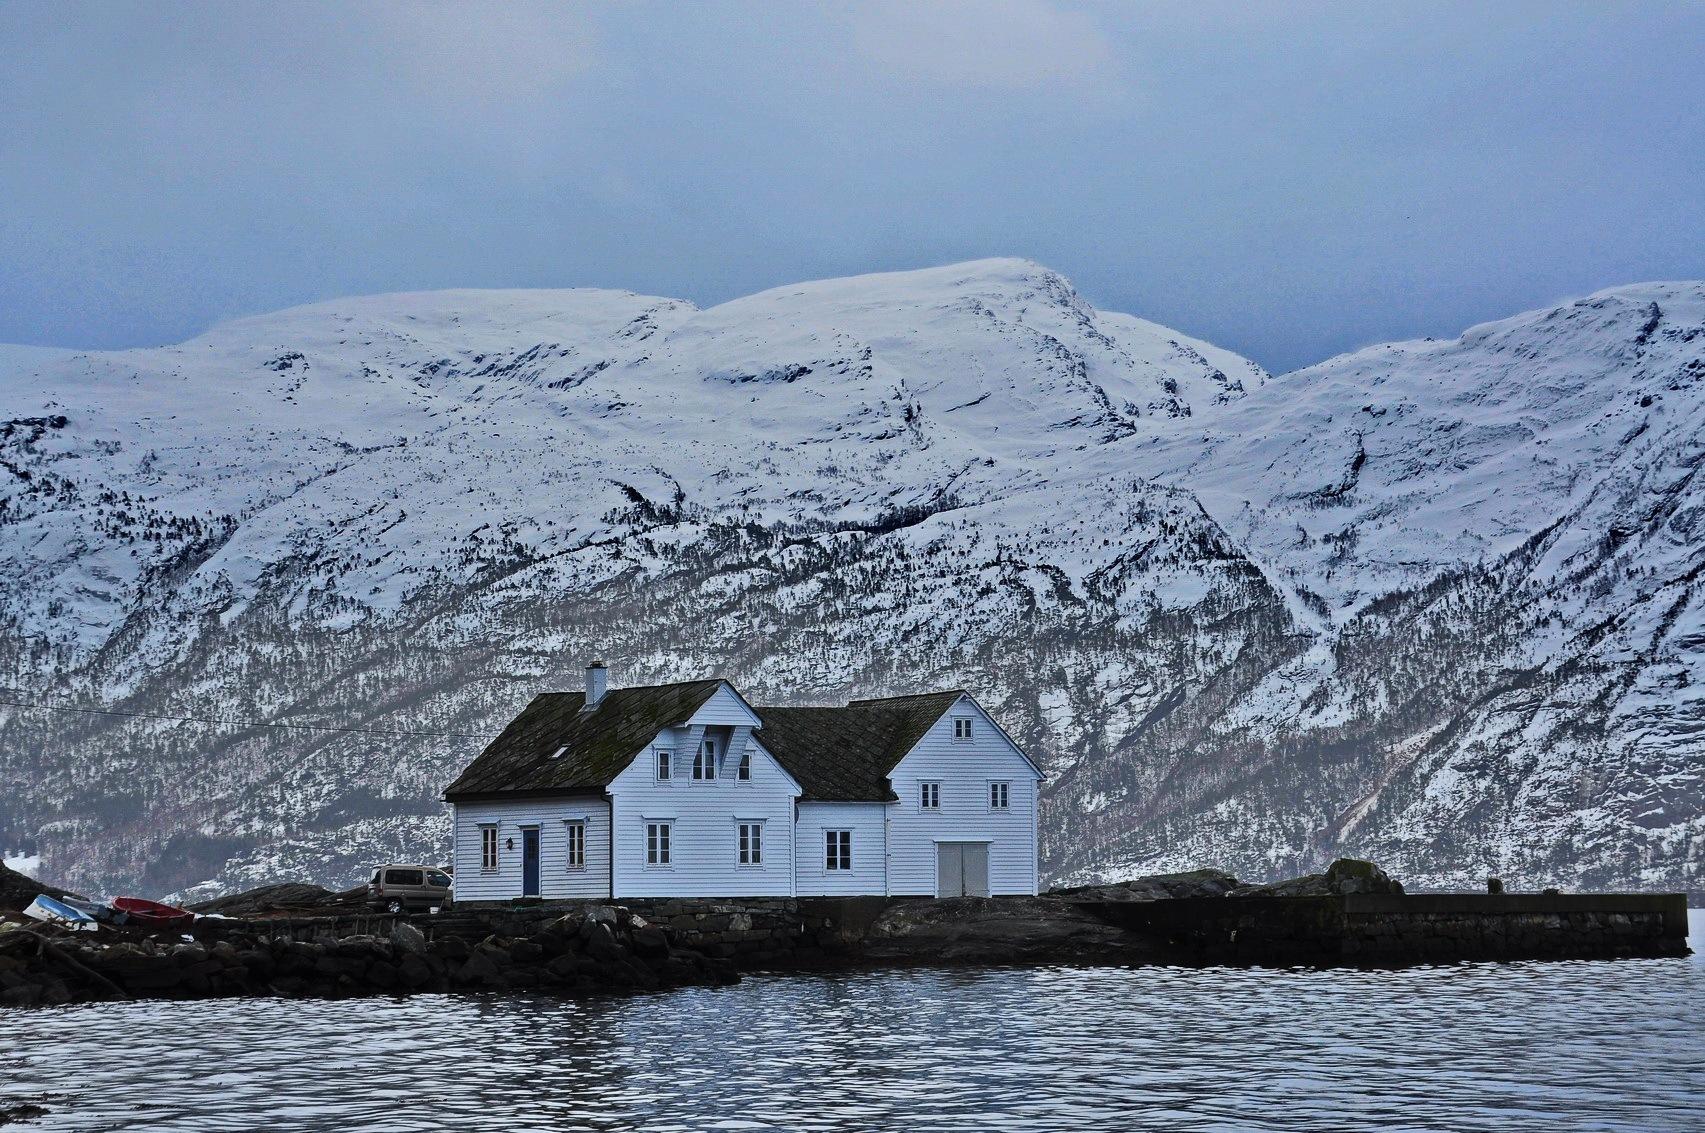 Wintertime at the Hardangerfjord by Per Molvik